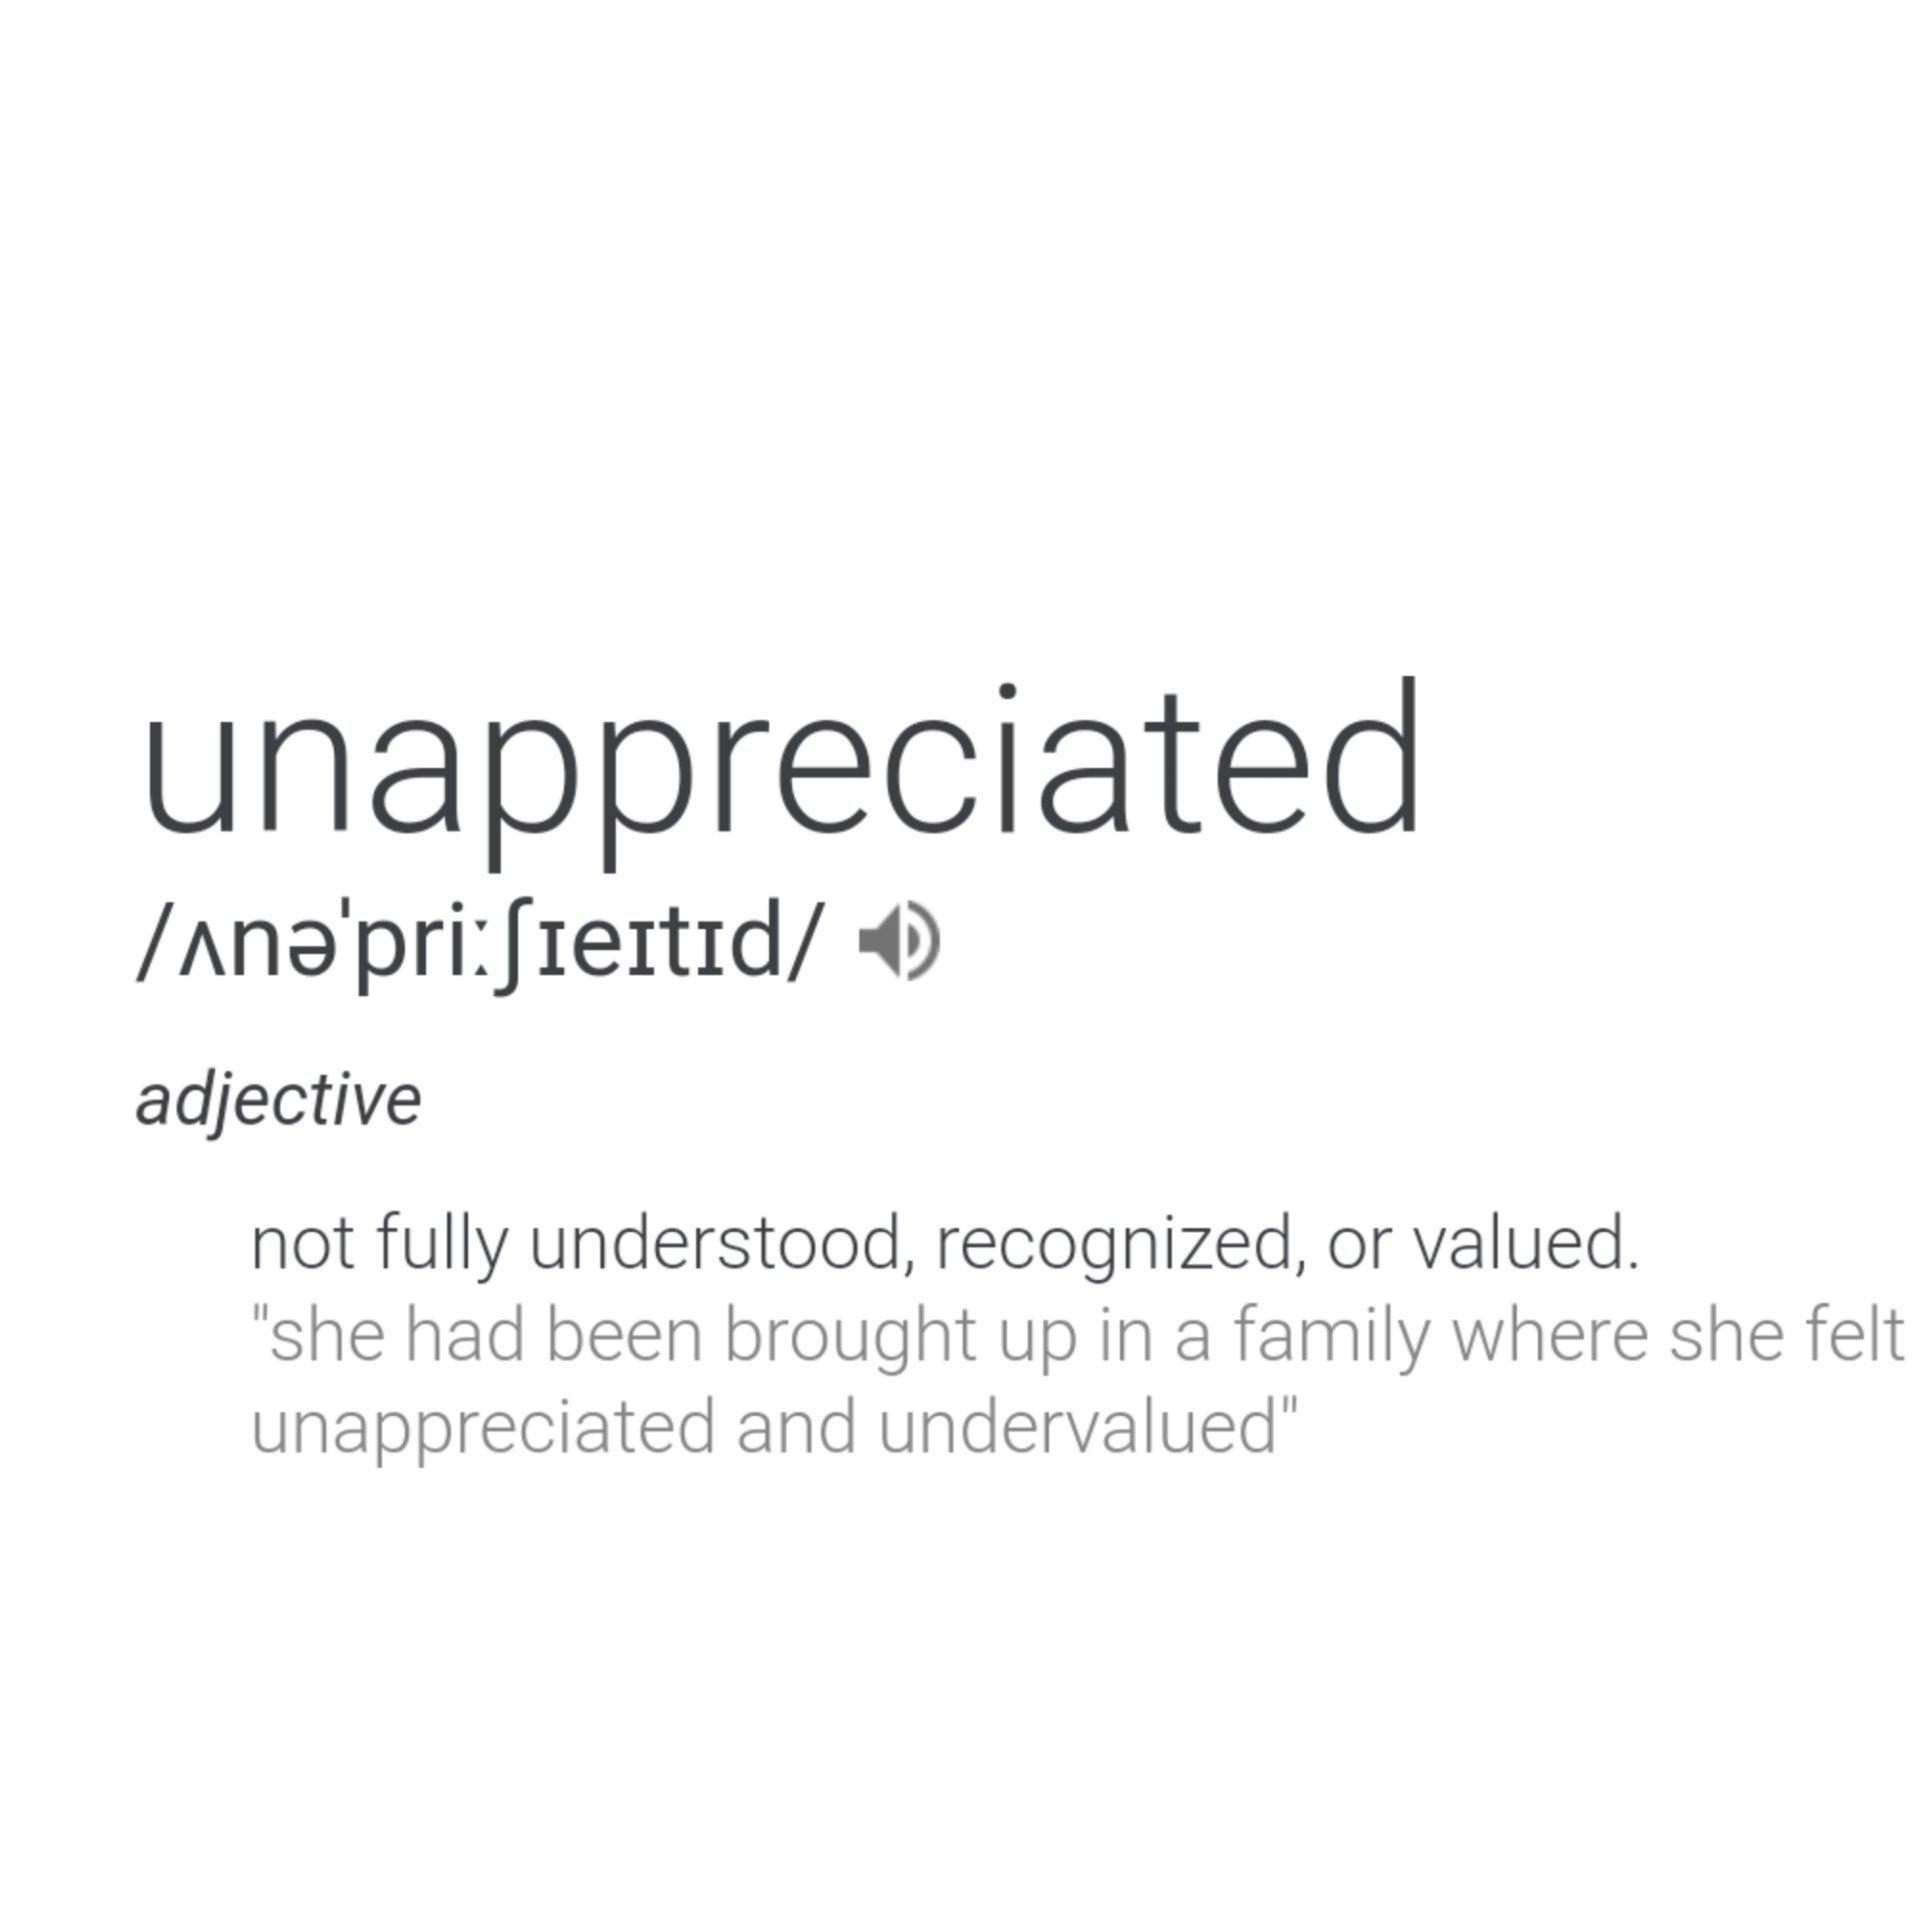 The pain of feeling unappreciated.